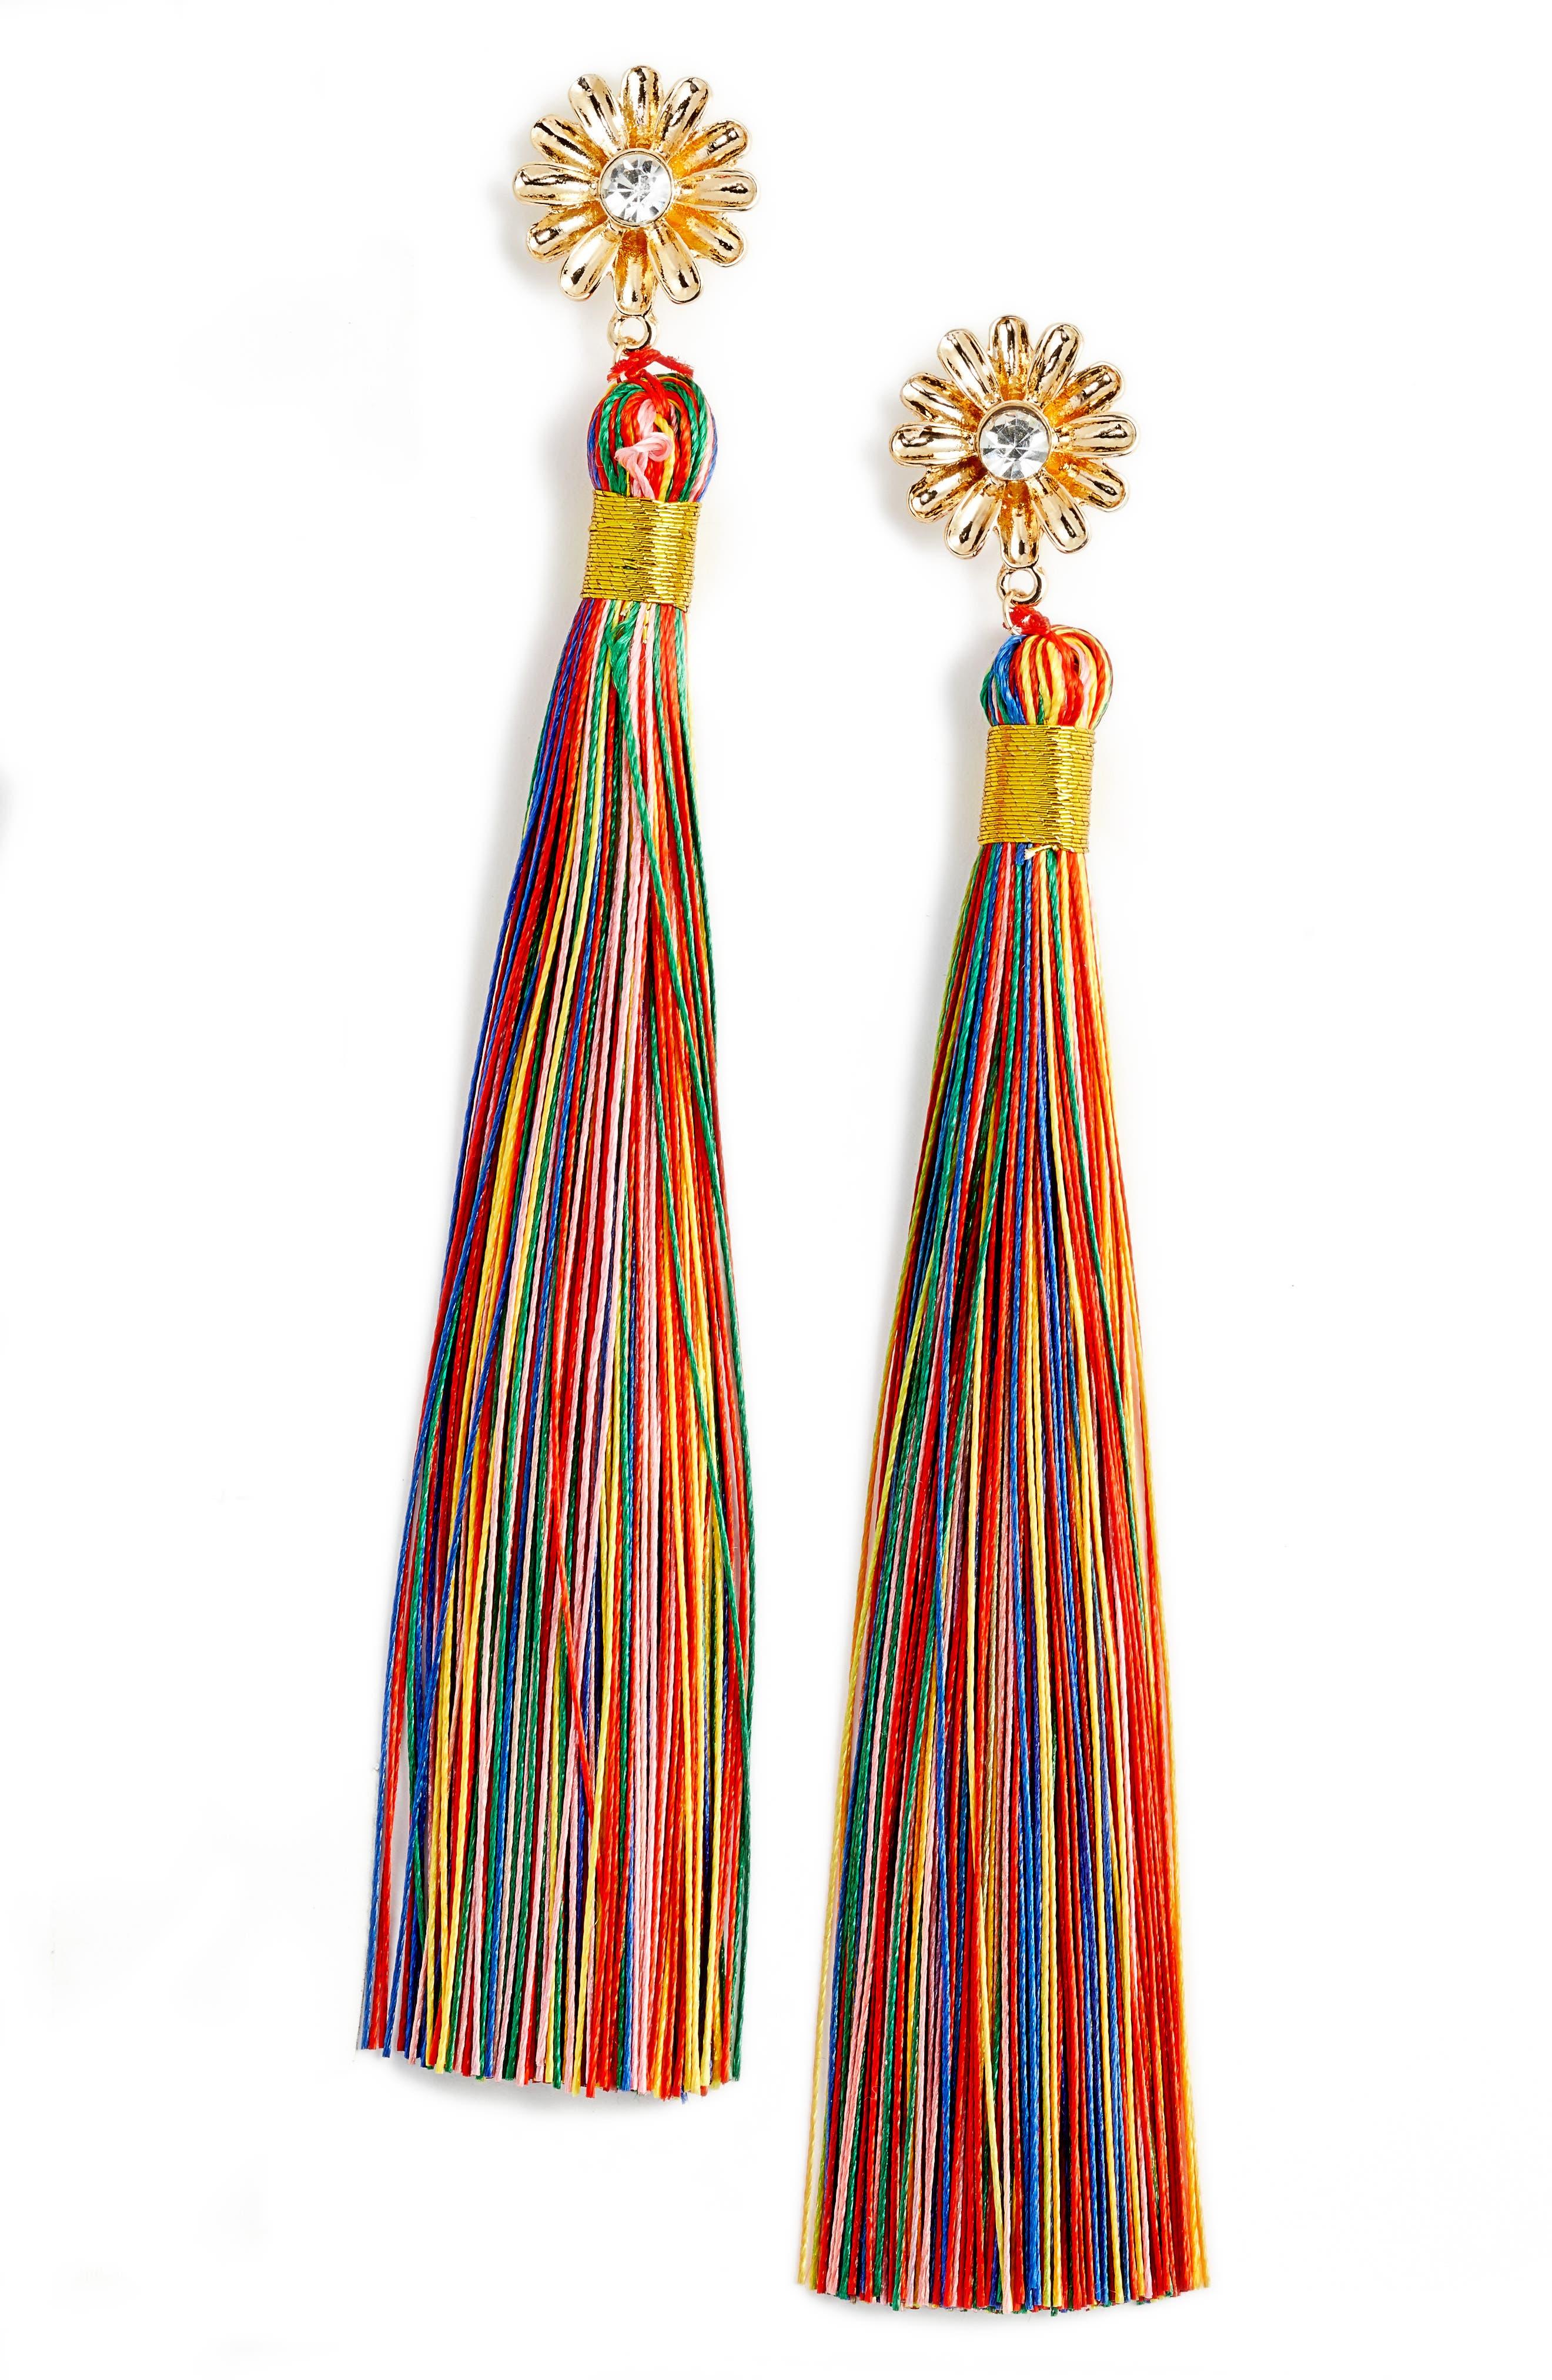 Dolce Tassel Earrings,                             Main thumbnail 1, color,                             710